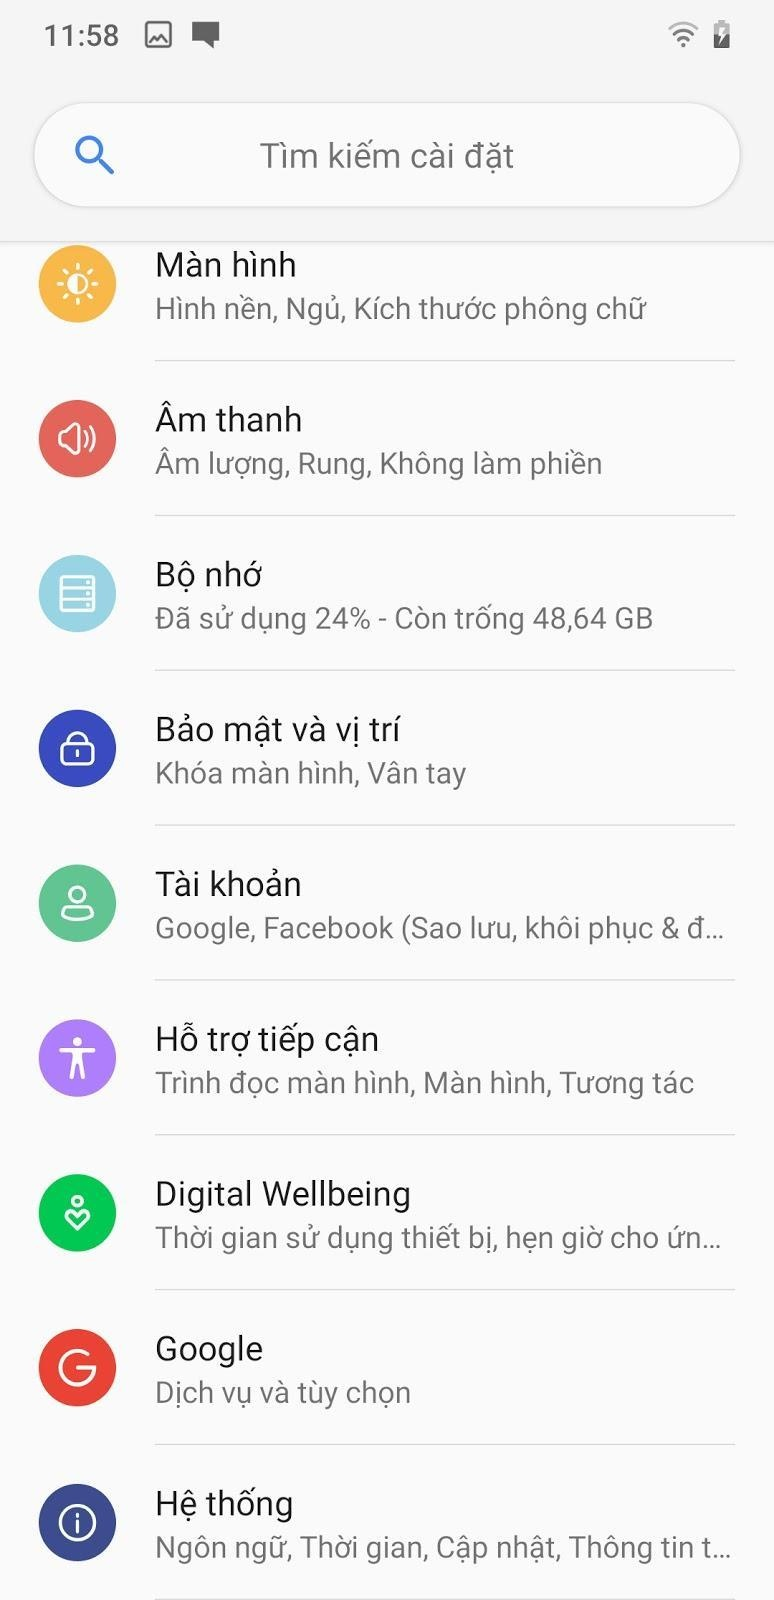 Toi nhan duoc gi khi mua mot chiec smartphone Viet tam gia 7 trieu? hinh anh 8